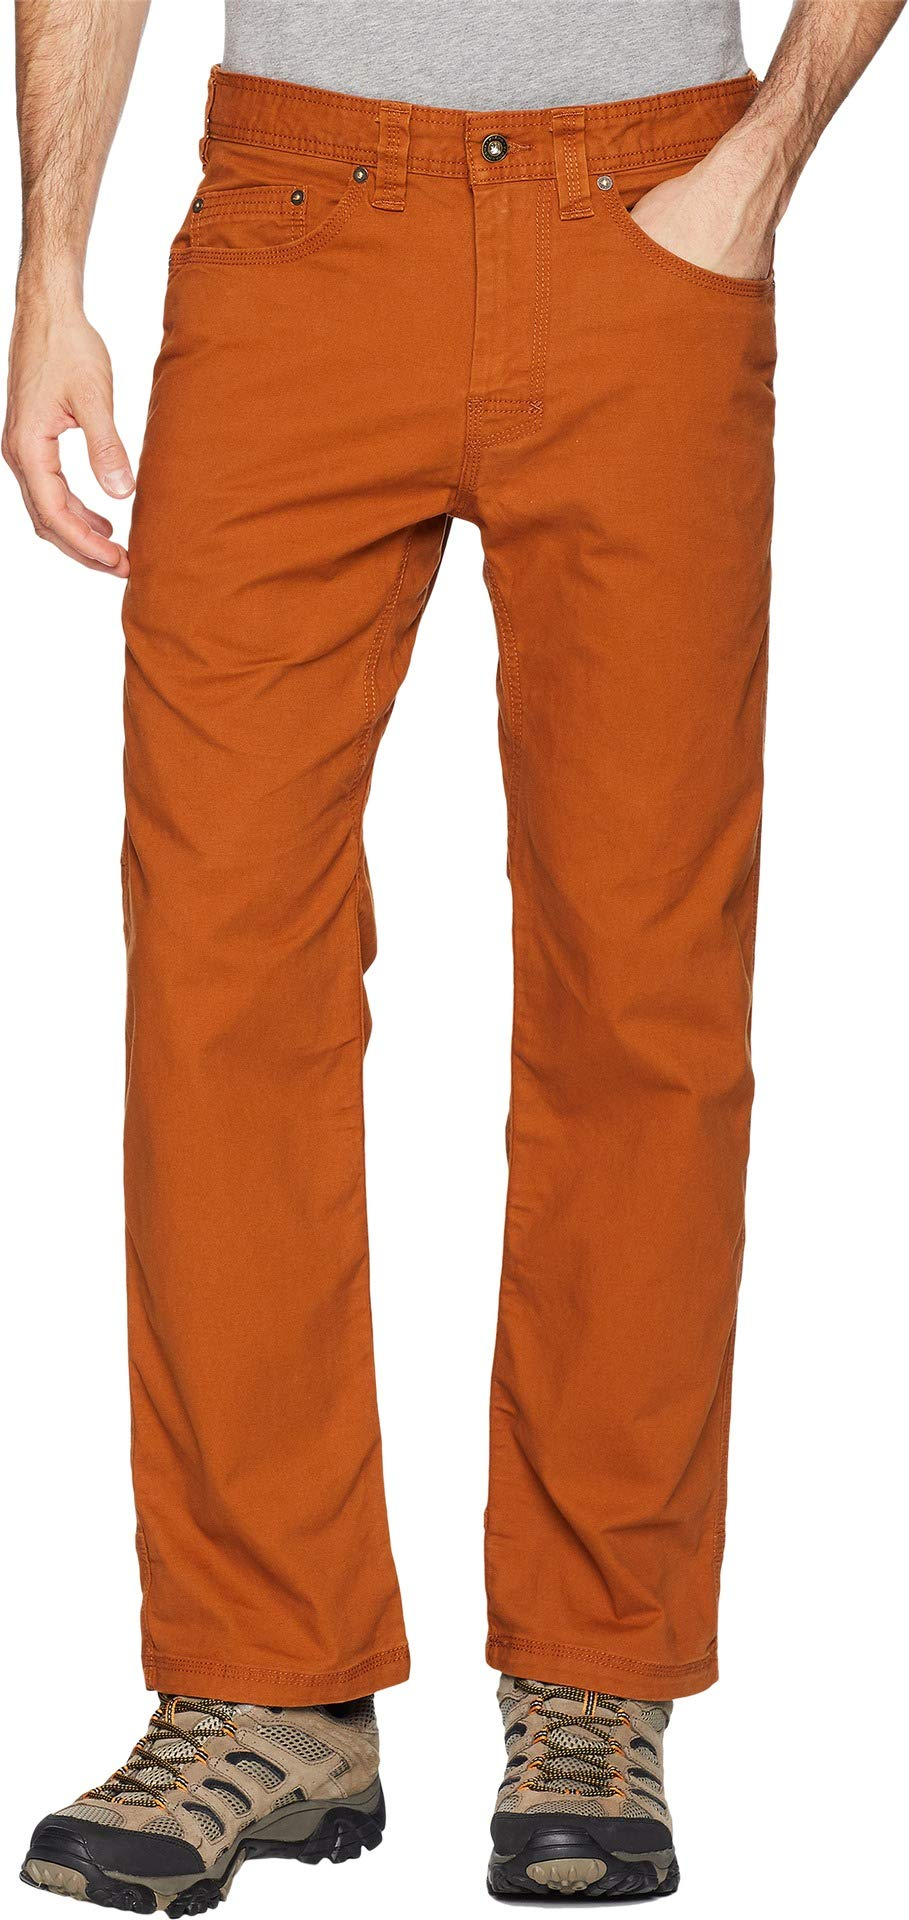 prAna Men's Bronson 30'''' Inseam Athletic Pants, Size 28, Burnt Caramel